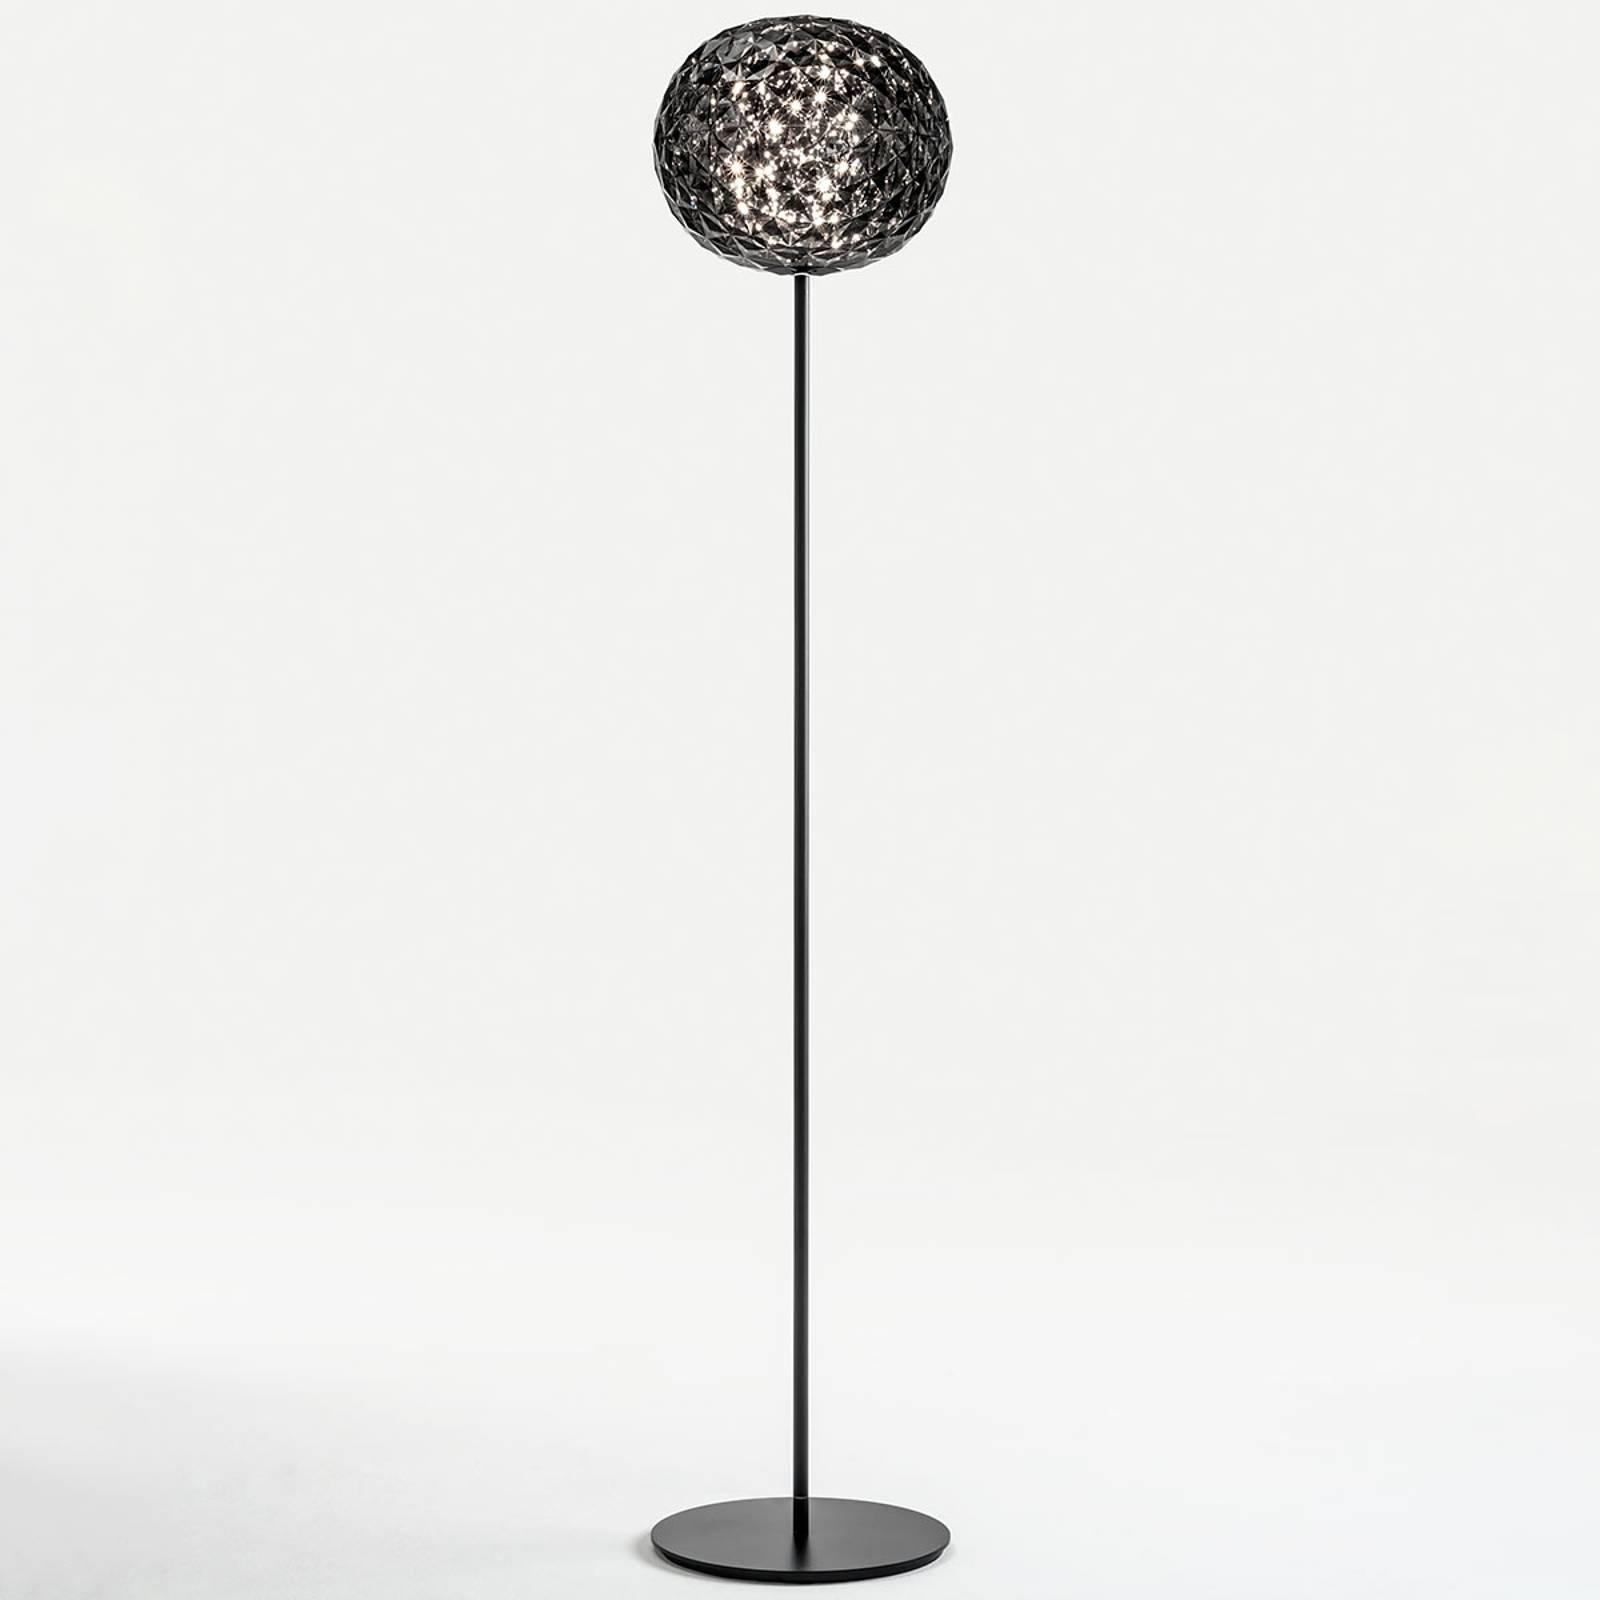 Kartell Planet-LED-lattiavalo, 160 cm, savunharmaa